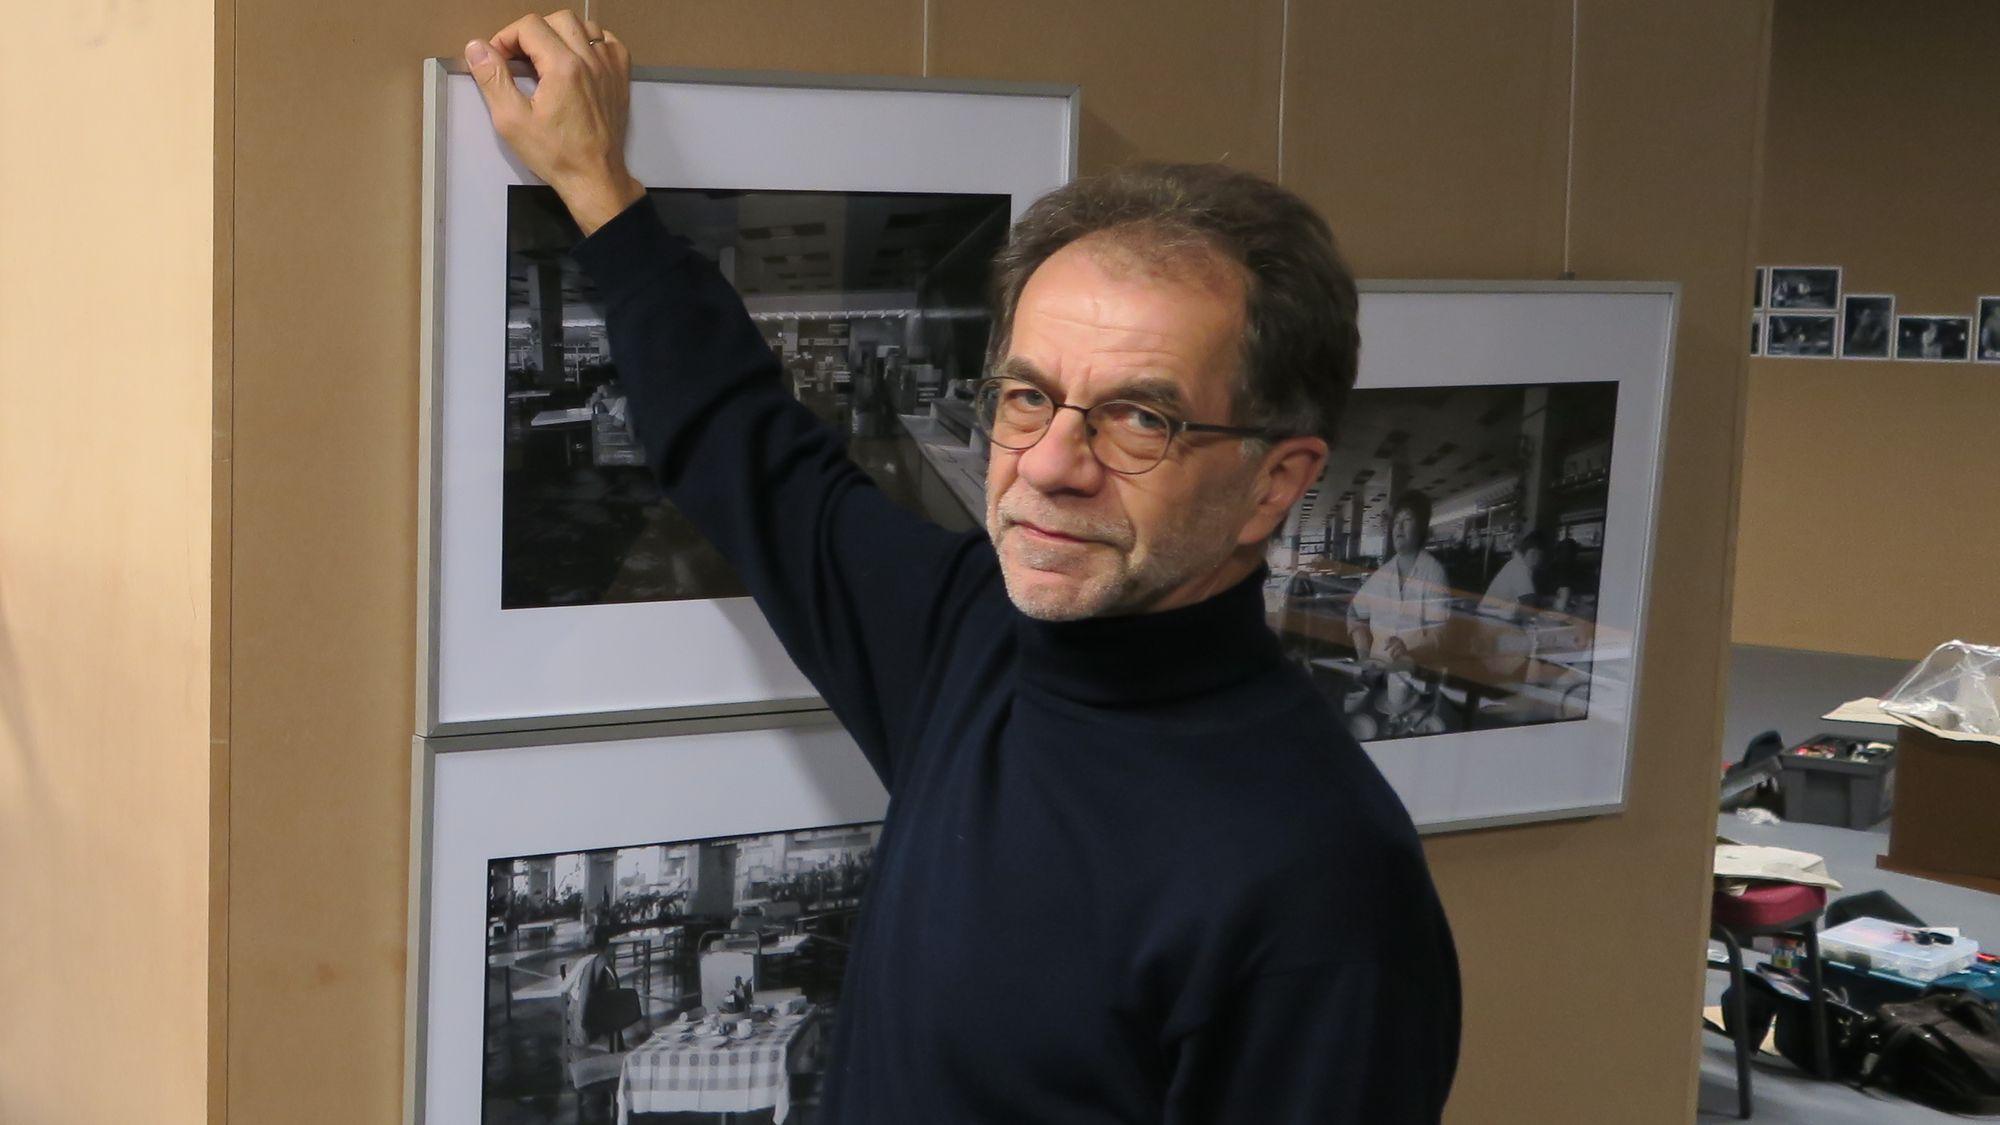 Thomas Kläber